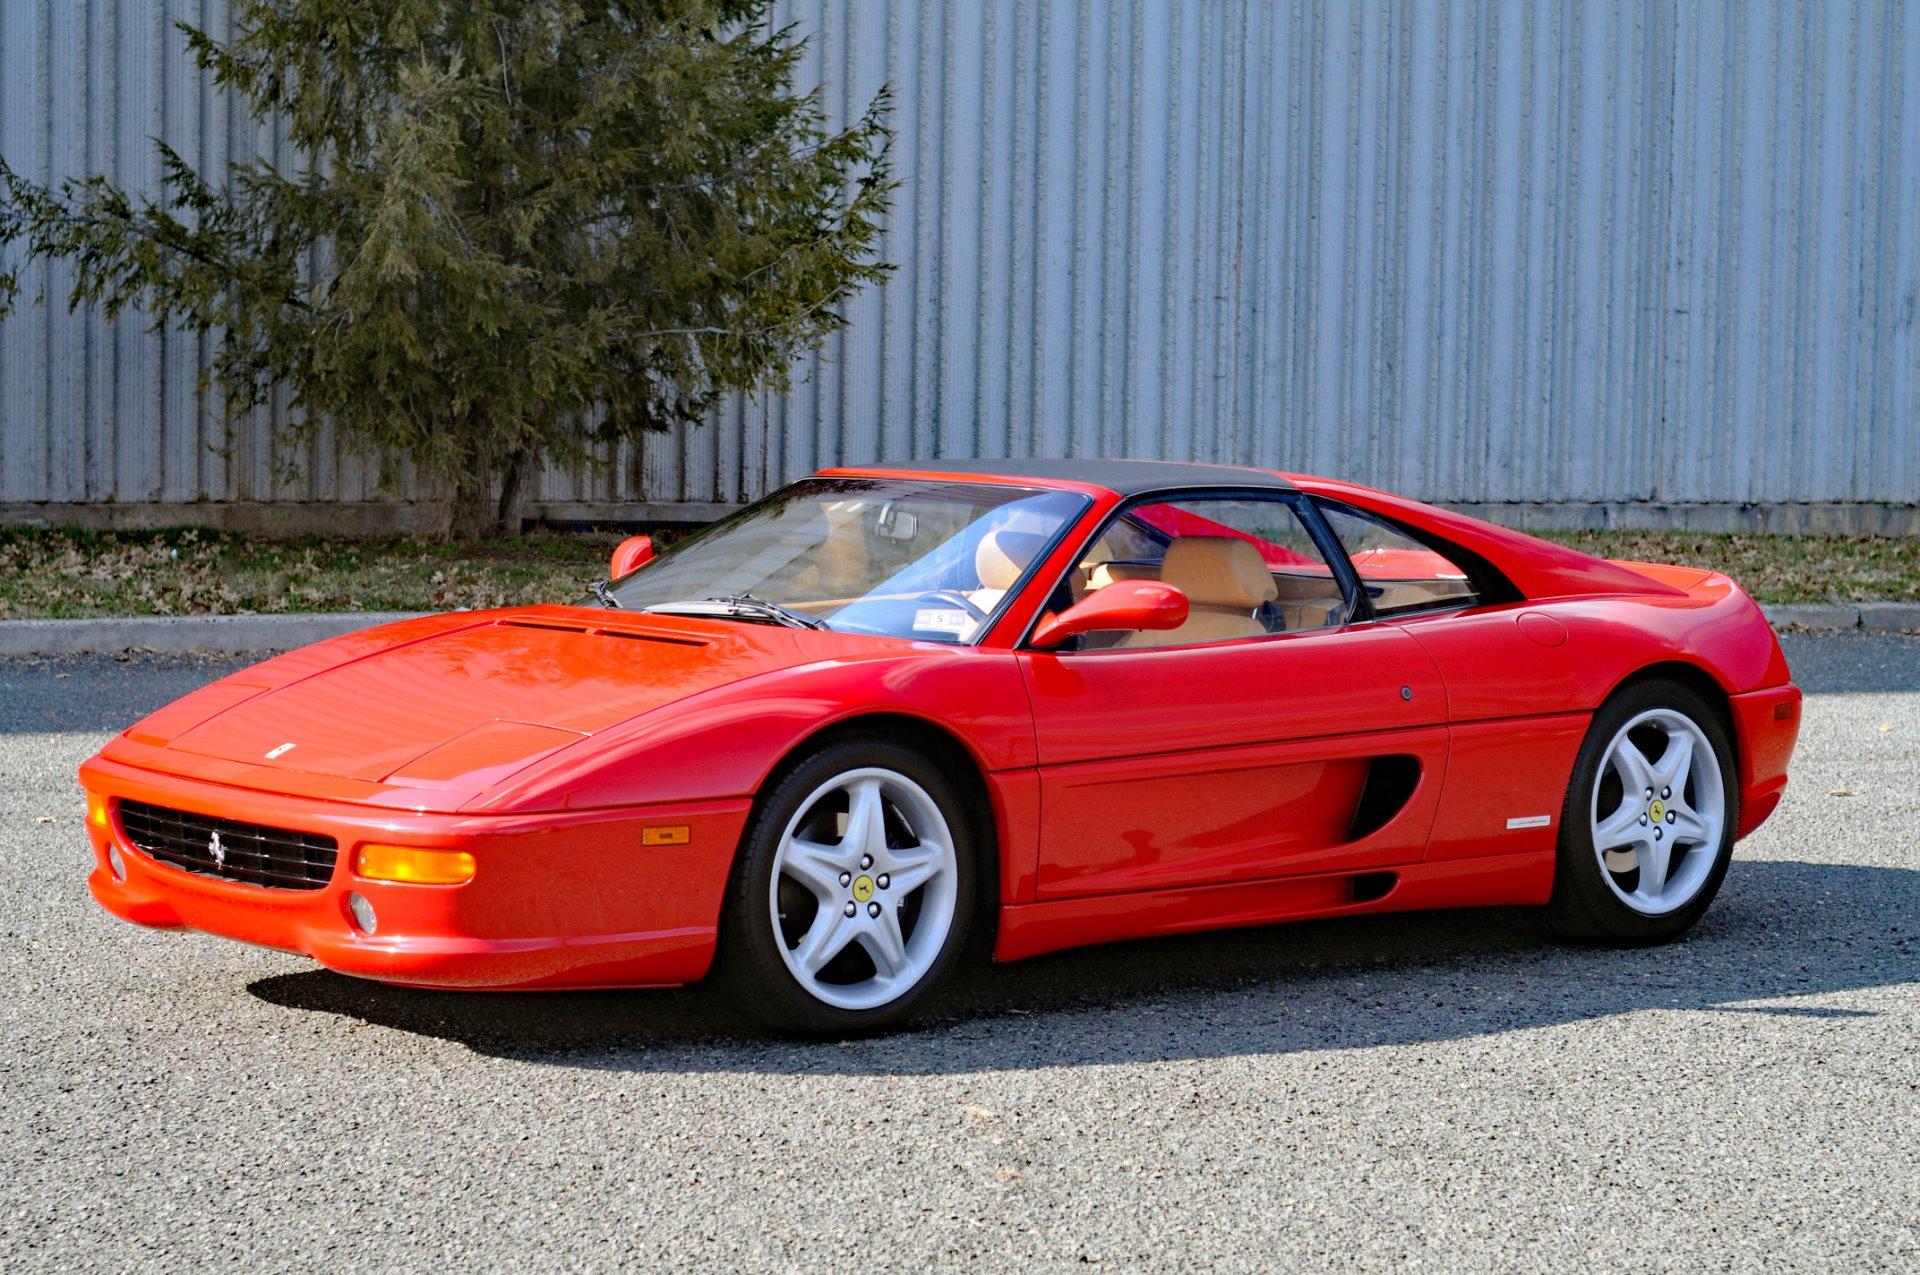 Used 1997 Ferrari 355 Gts For Sale Special Pricing Ambassador Automobile Llc Stock 174